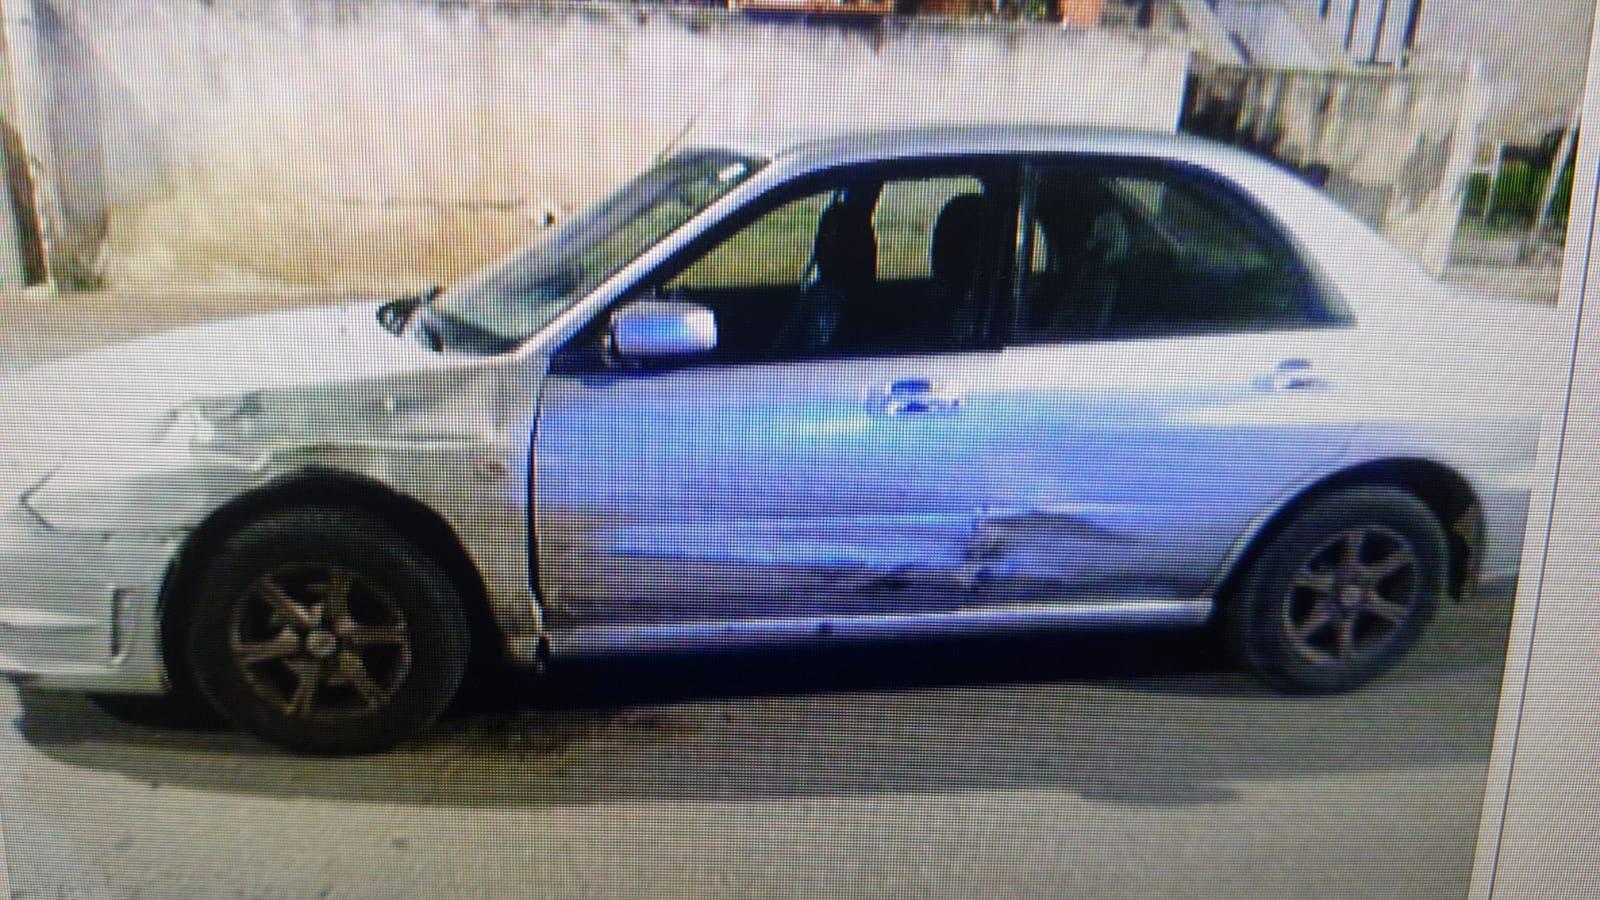 Photo of תושב אור יהודה נסע ברחבי העיר כשהוא פוגע ברכבים חונים ואף באזרח שנקלע בדרכו. שכחנו לציין: התושב בן 14.5